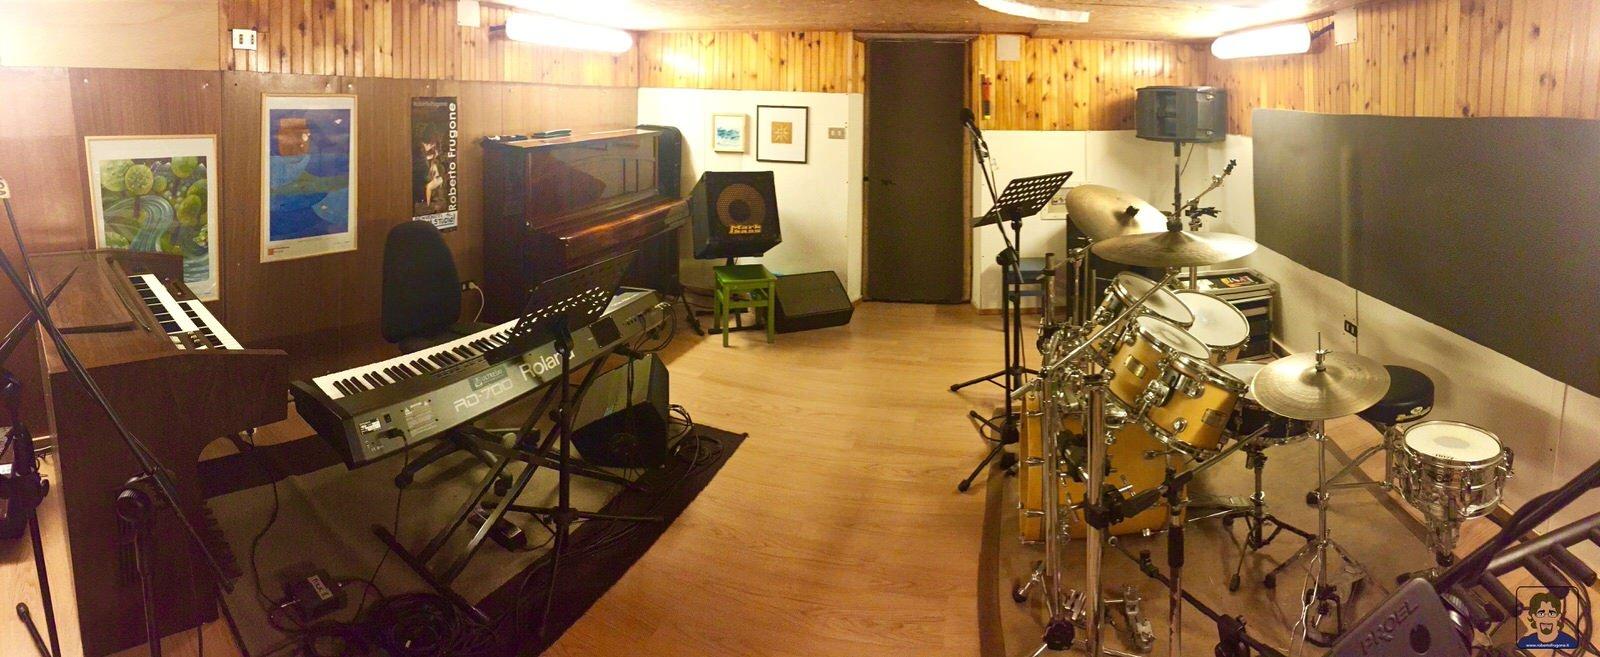 Totem Studio Sala Prove Musicali Casarza Ligure 02